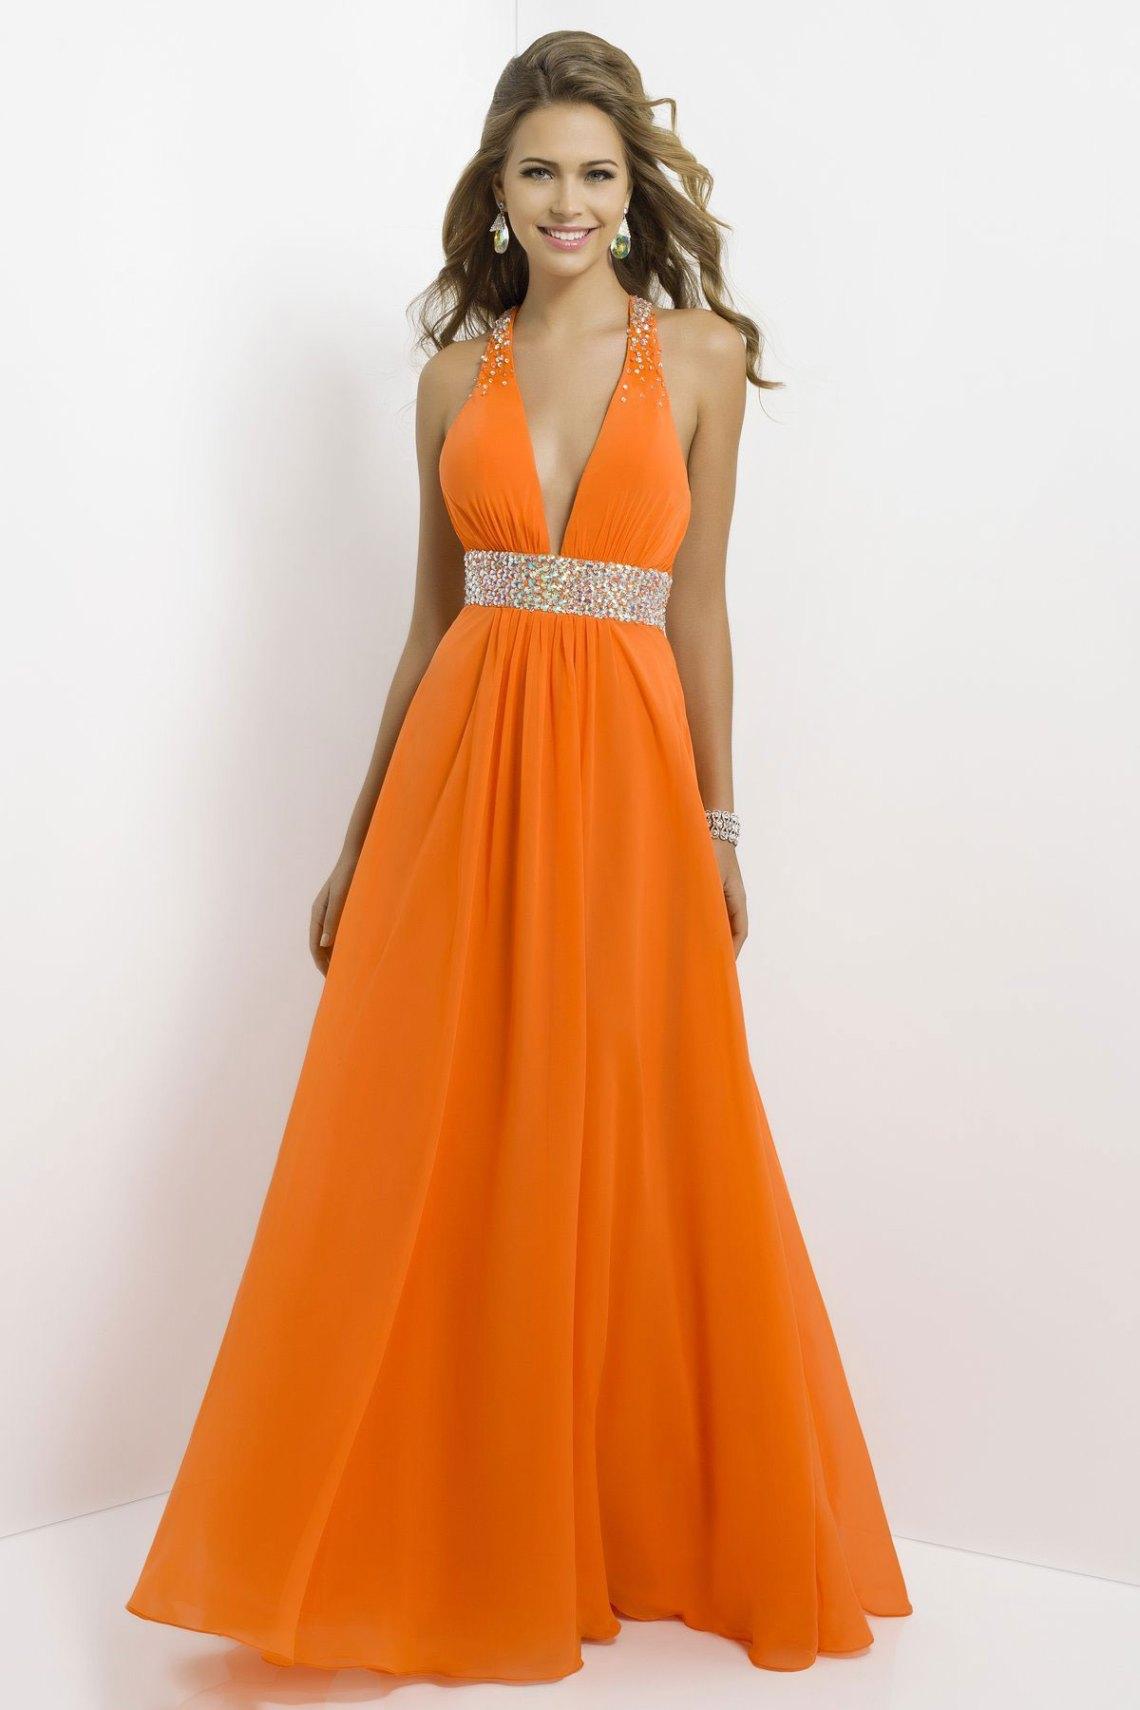 aisle style dresses (4)